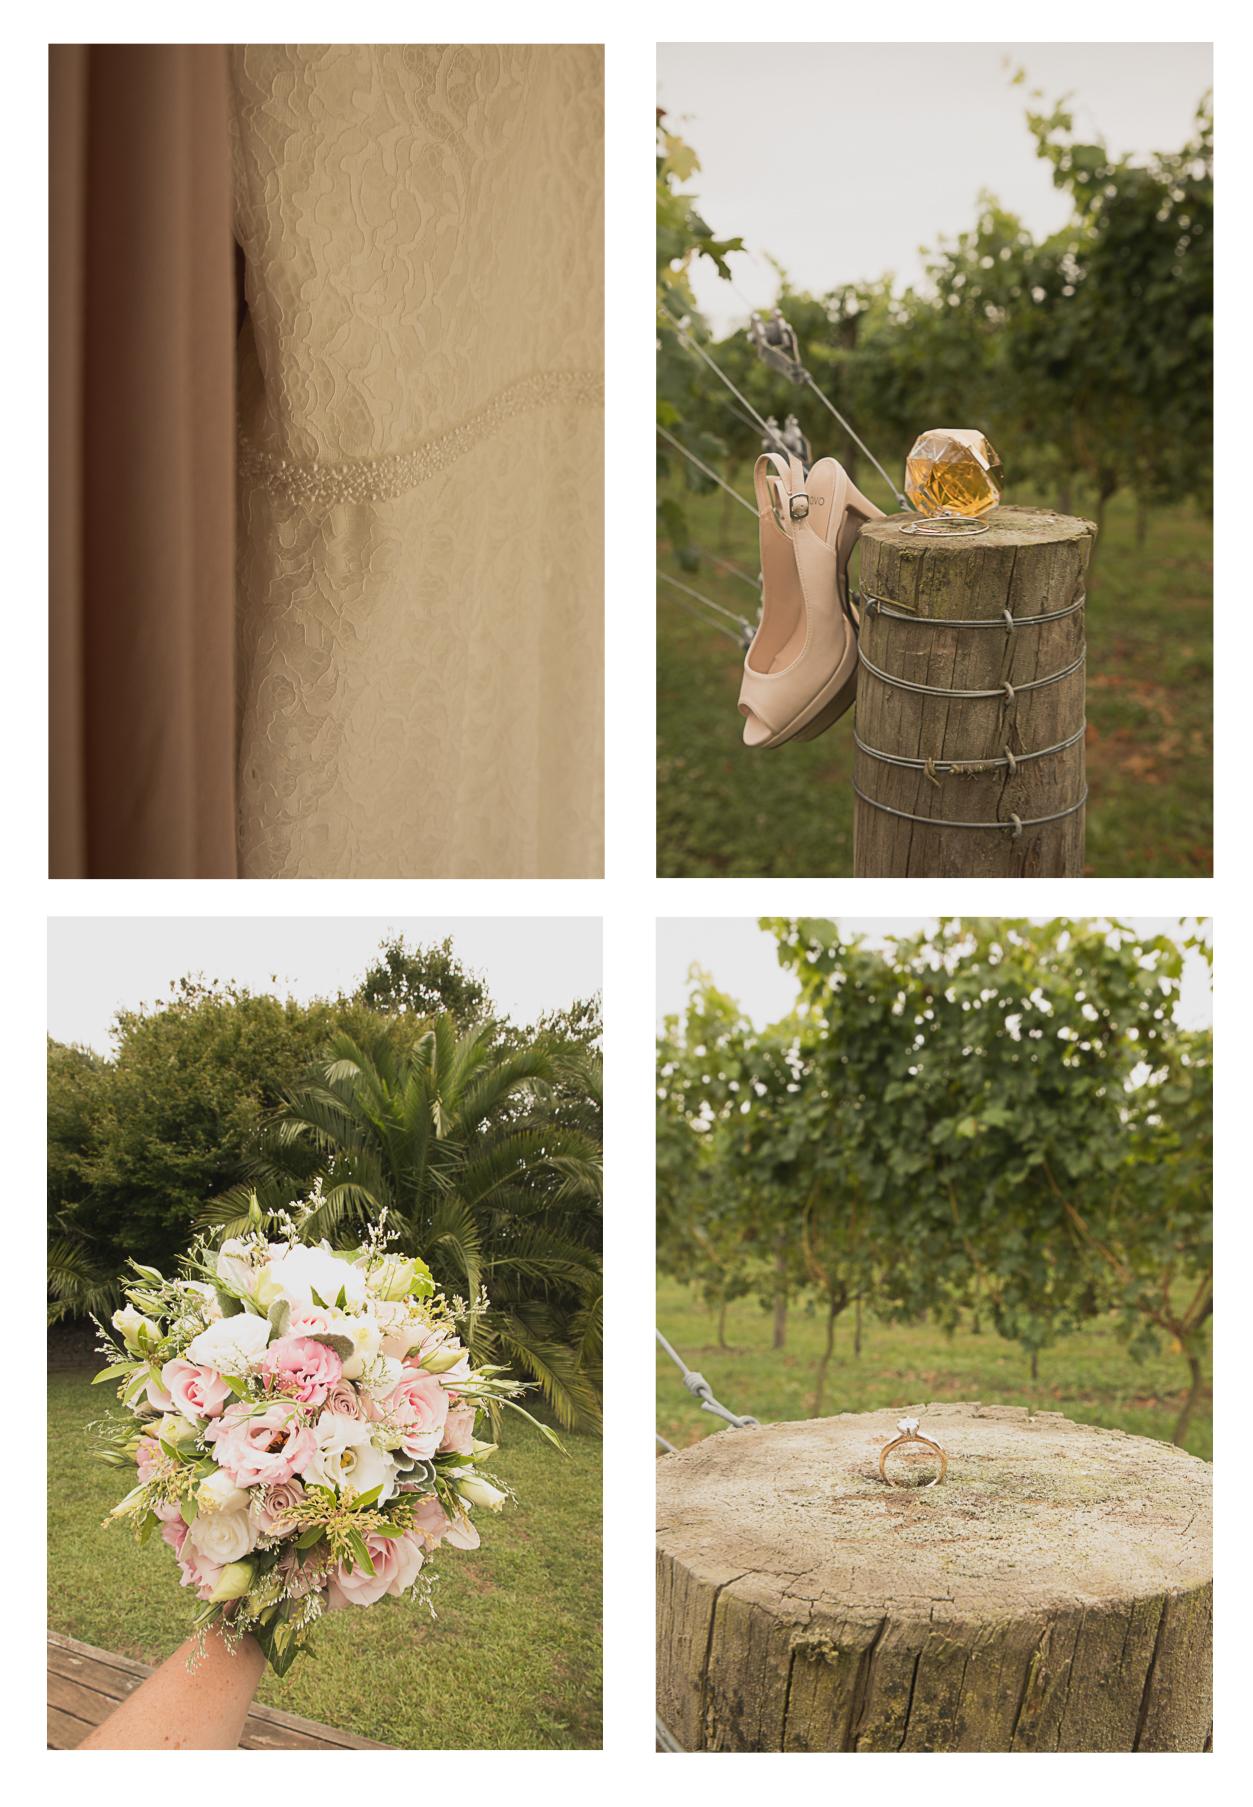 bridal-details-for-wedding-day.jpg